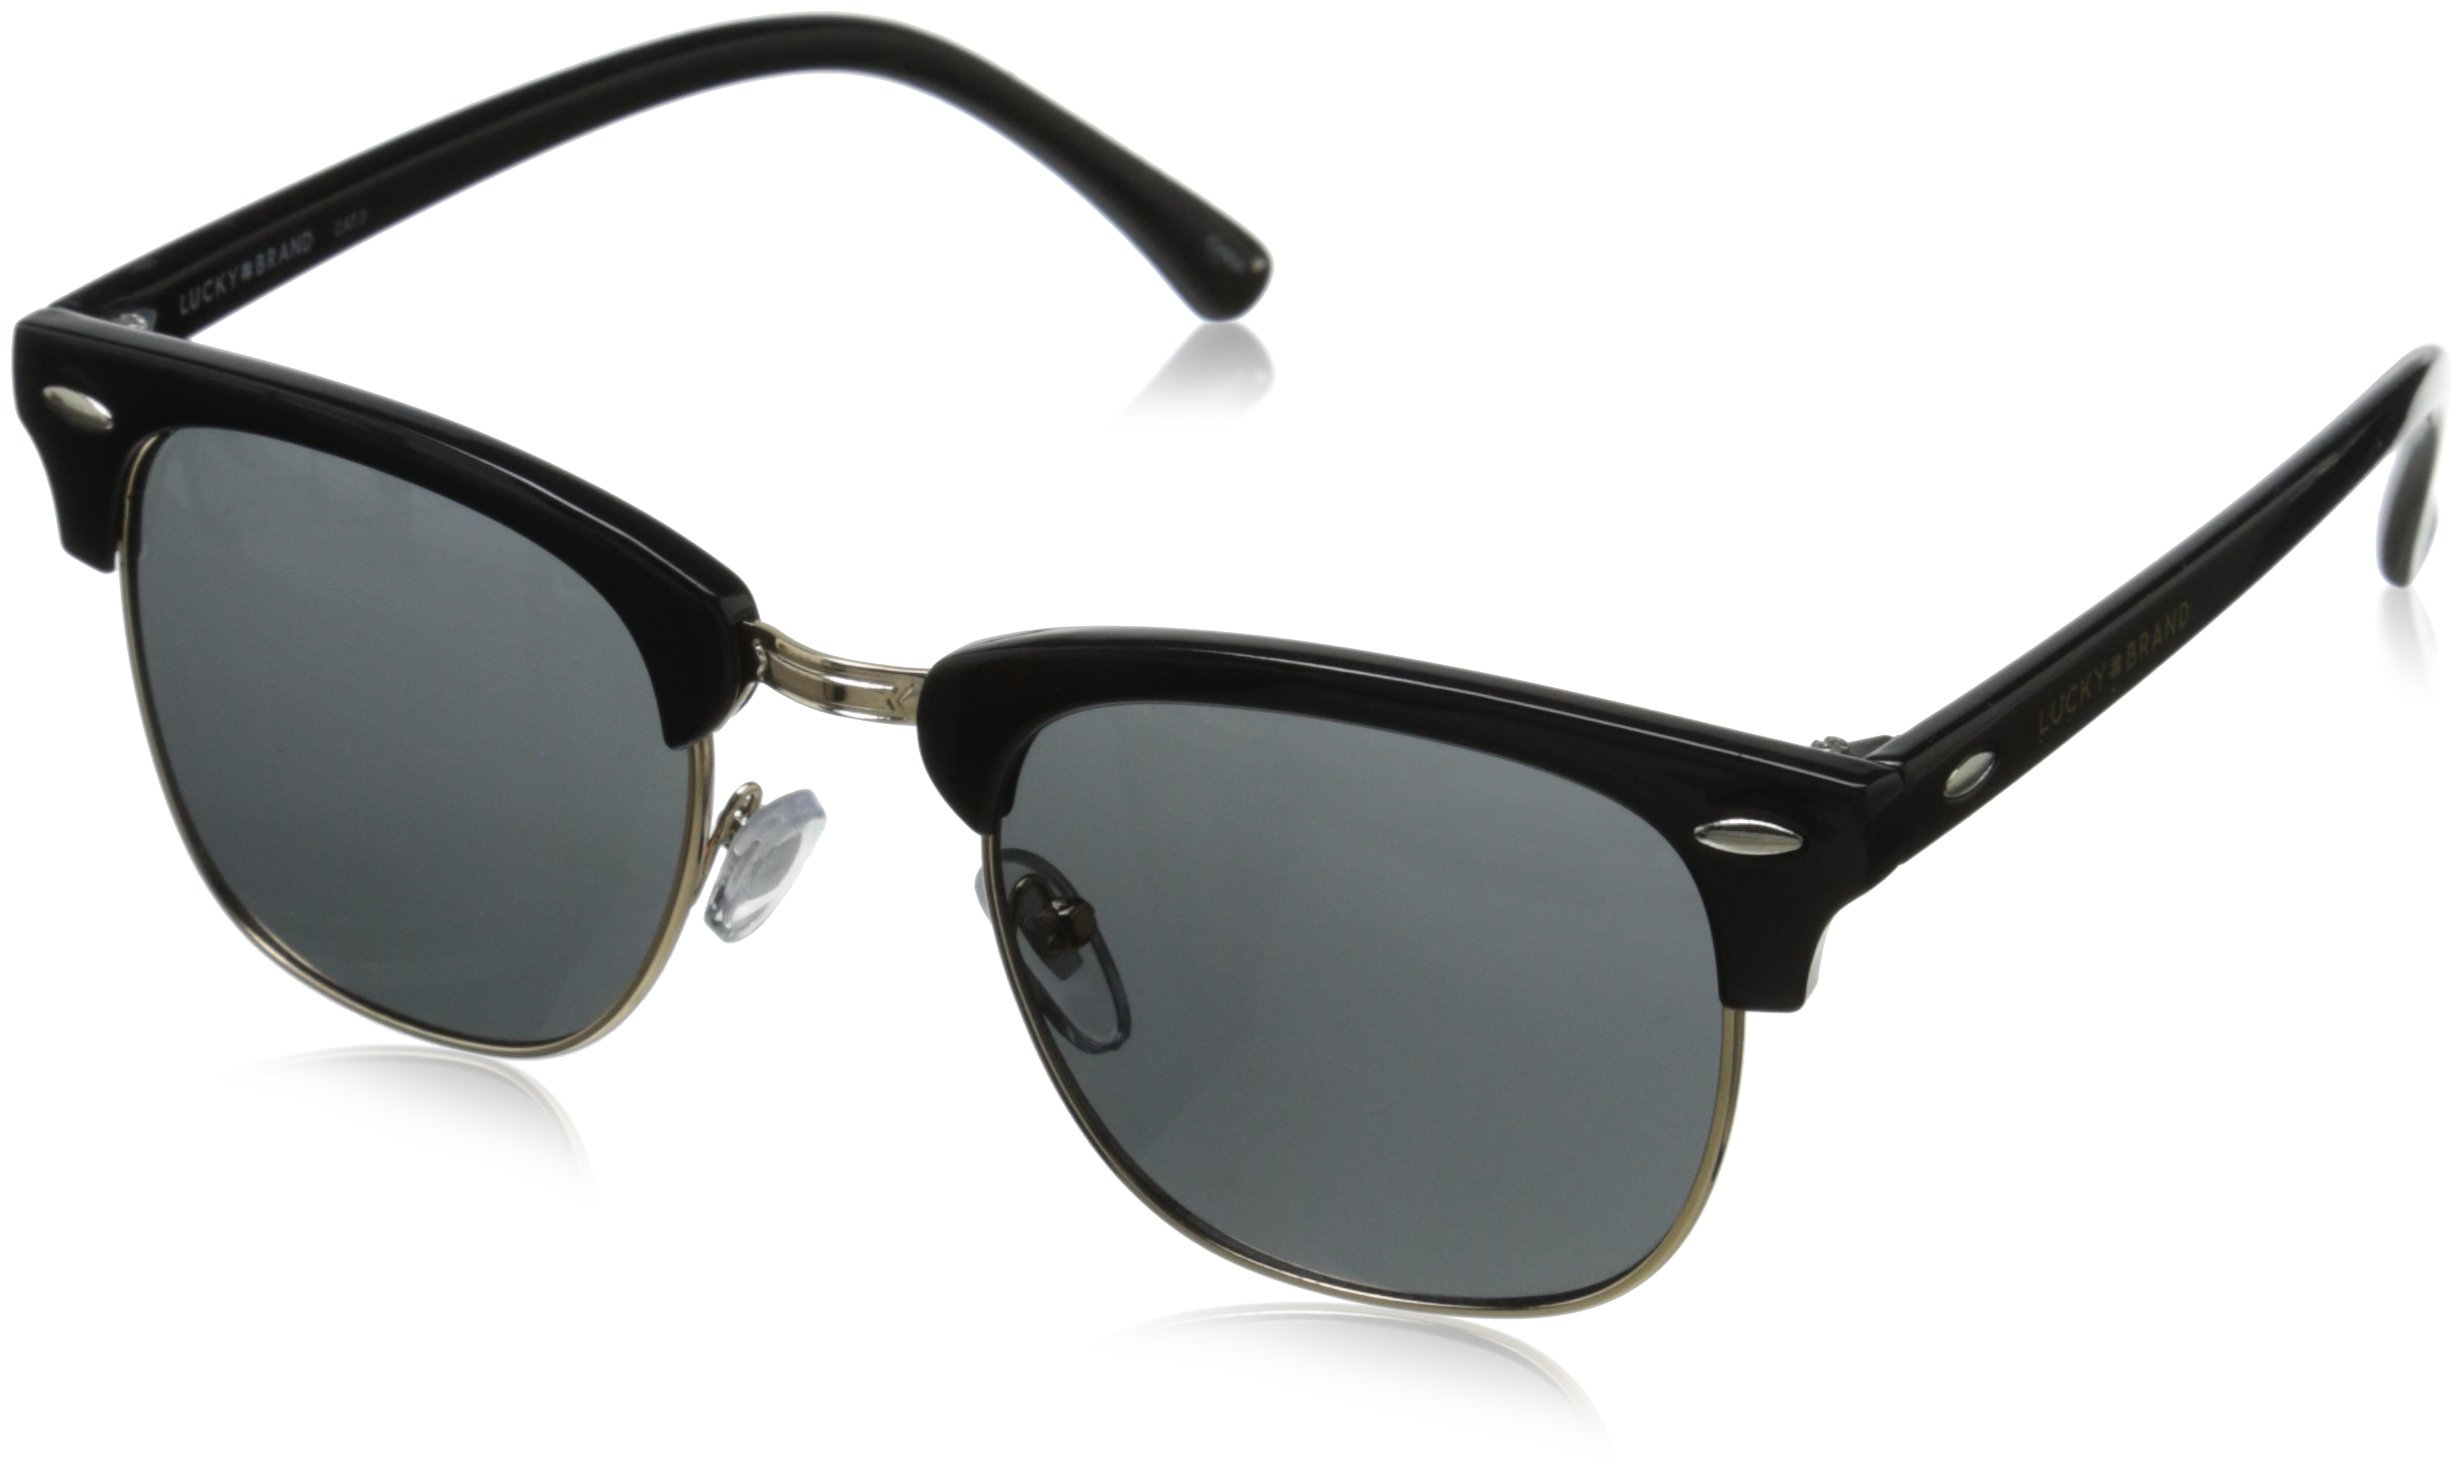 Lucky Unisex-Adult D901bla50 Cateye Sunglasses, BLACK, 50 mm